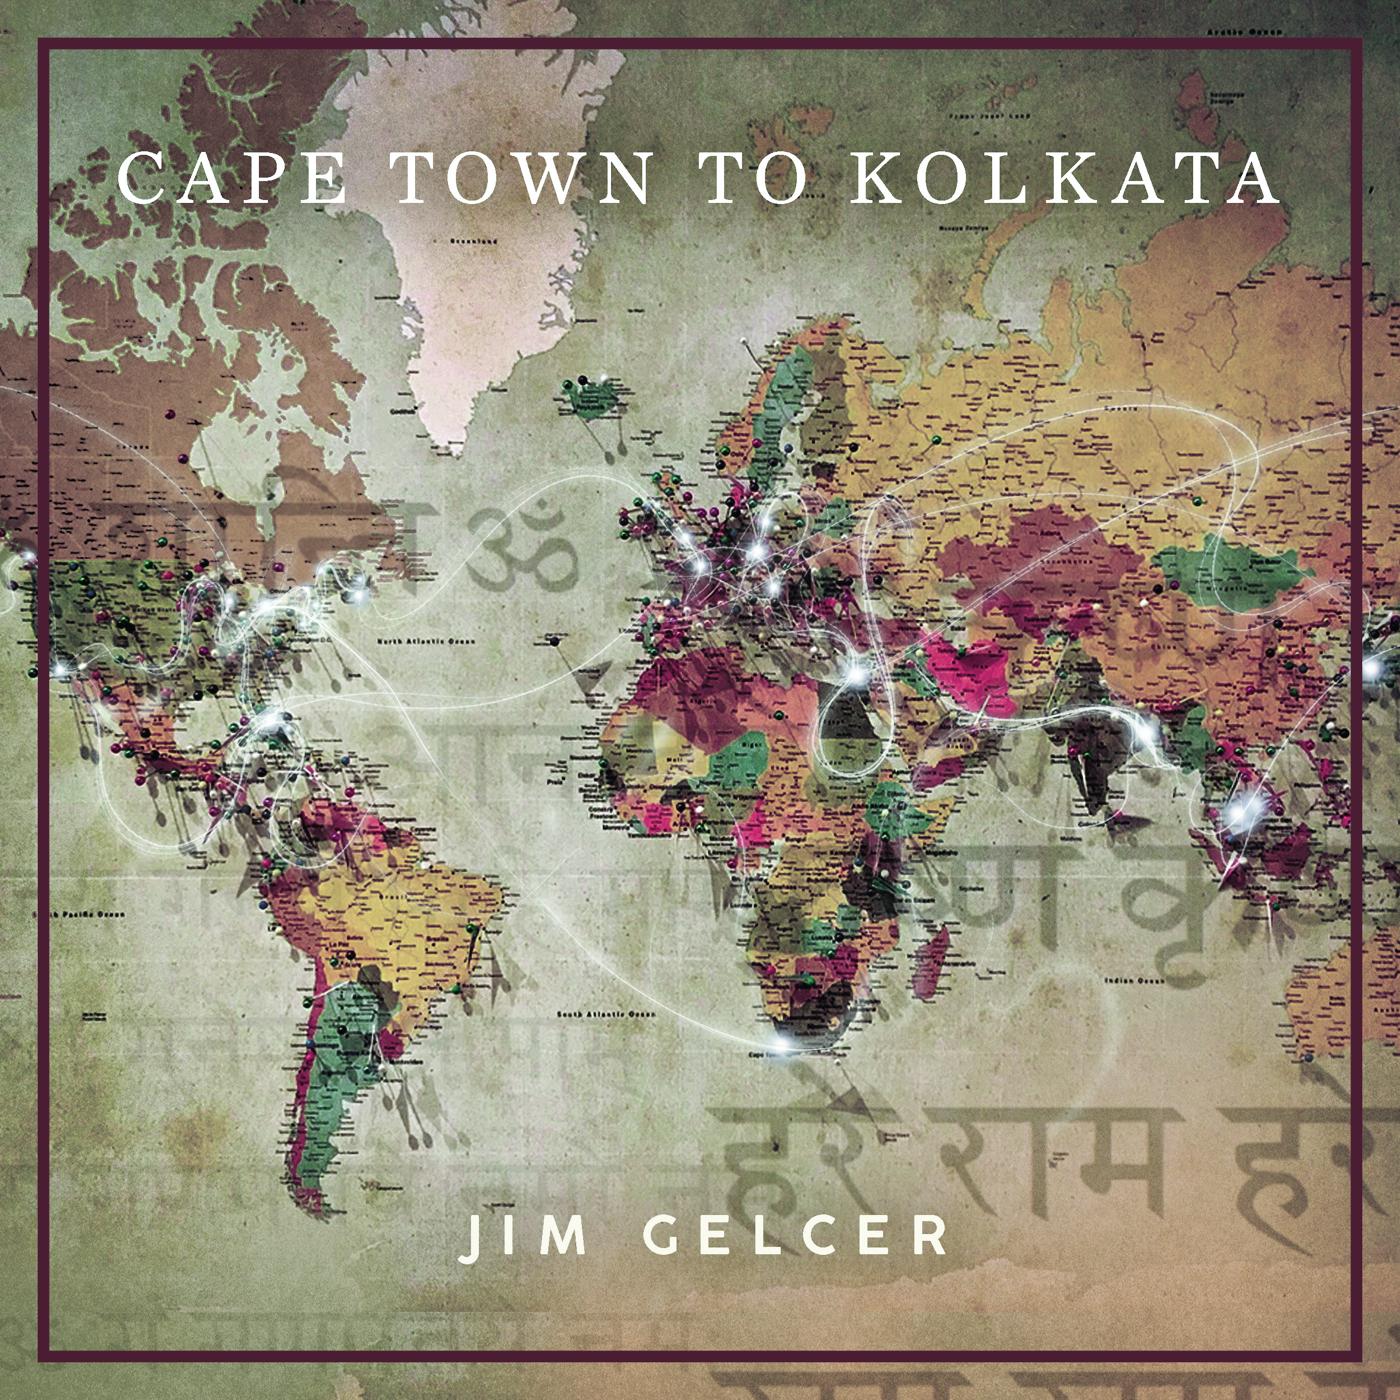 Cape Town to Kolkata Jim Gelcer